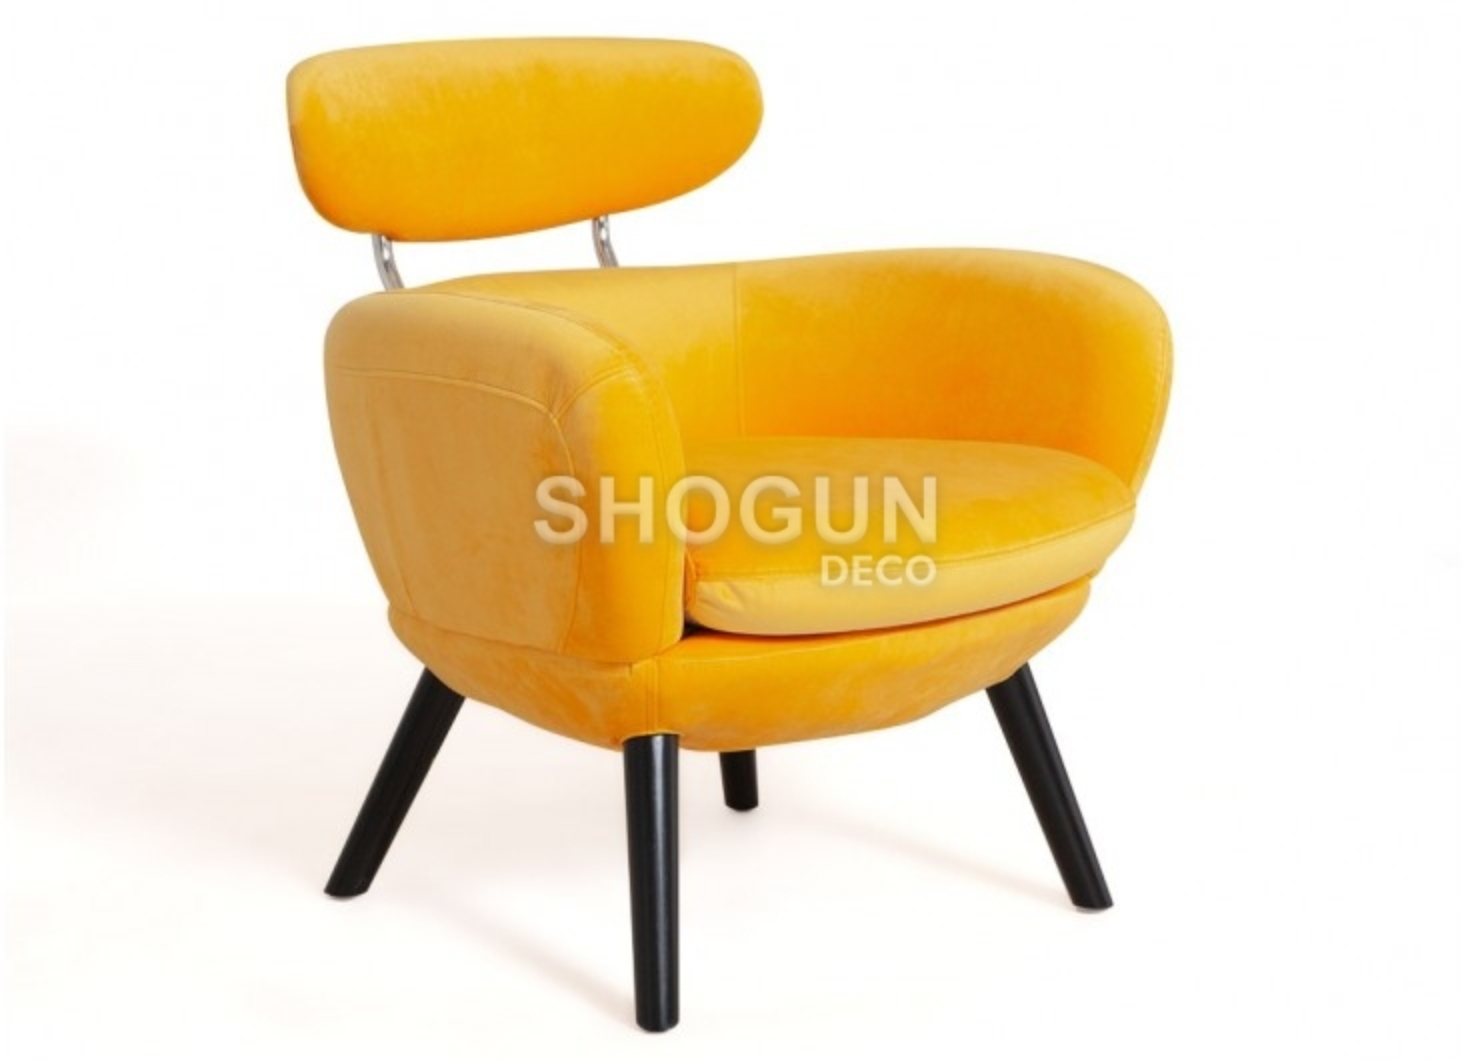 Fauteuil club Rubis - velours jaune orangé